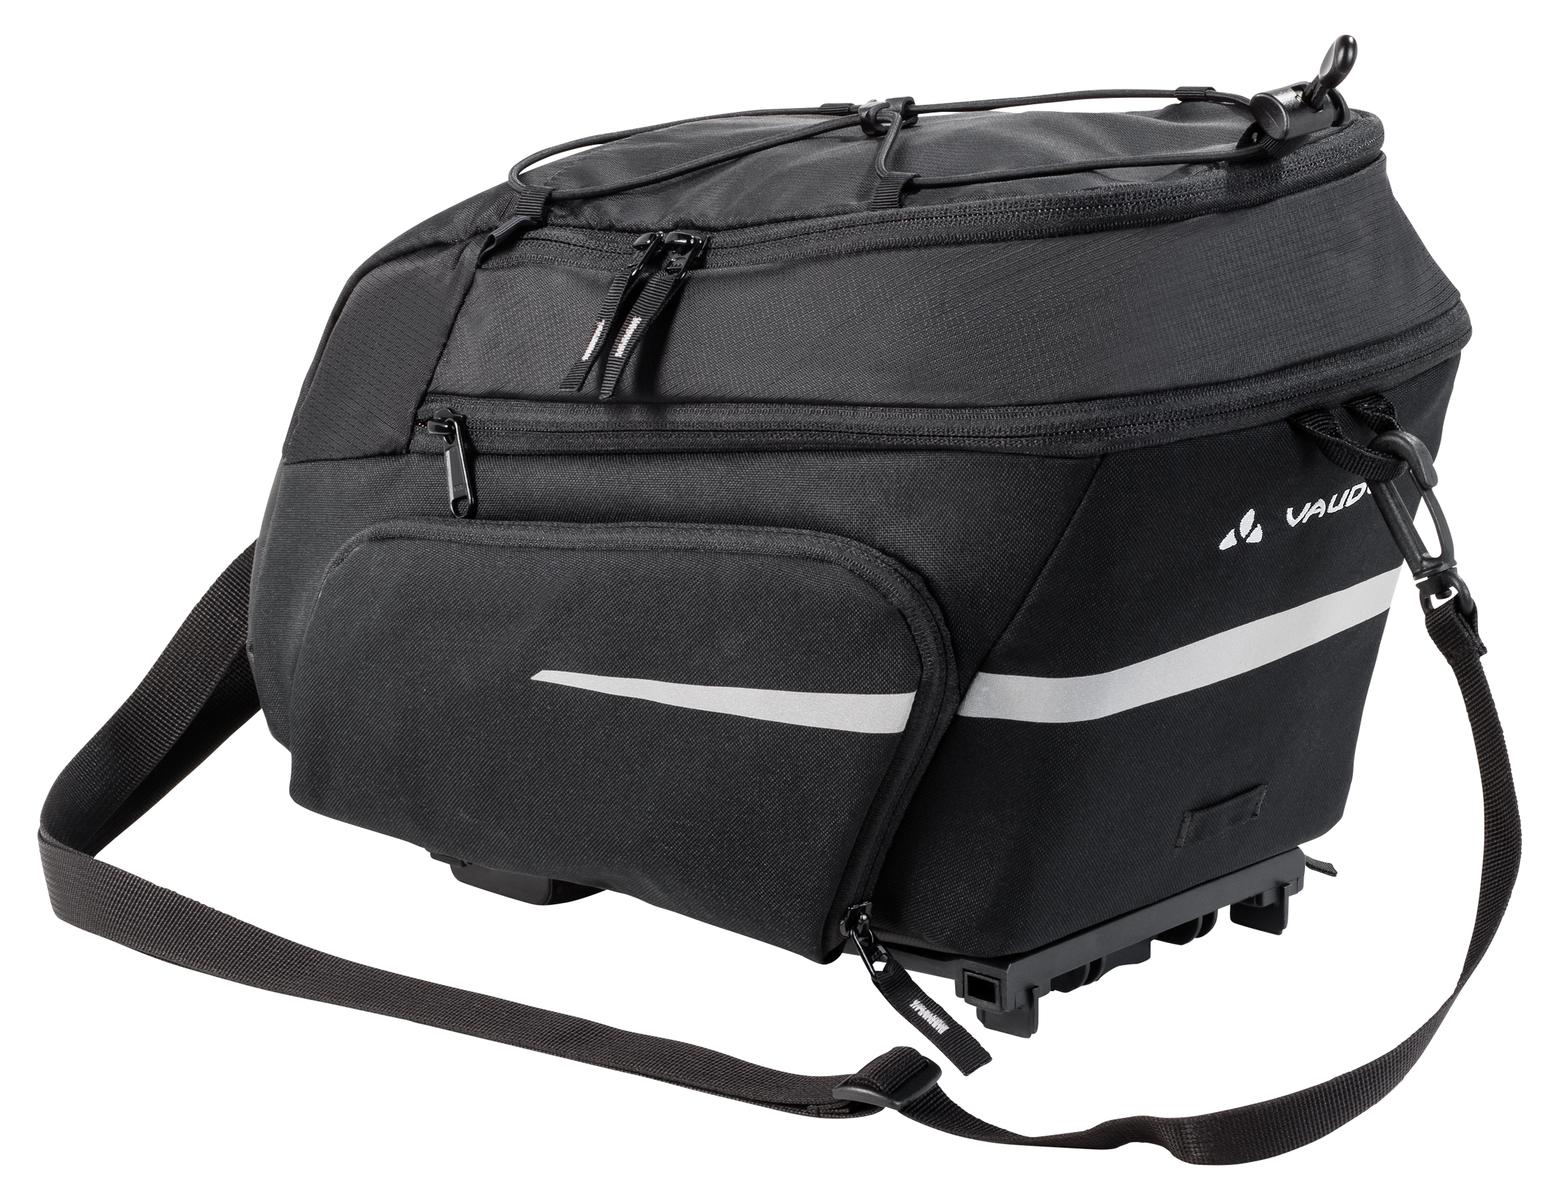 VAUDE Silkroad Plus (i-Rack) black  - 2-Rad-Sport Wehrle